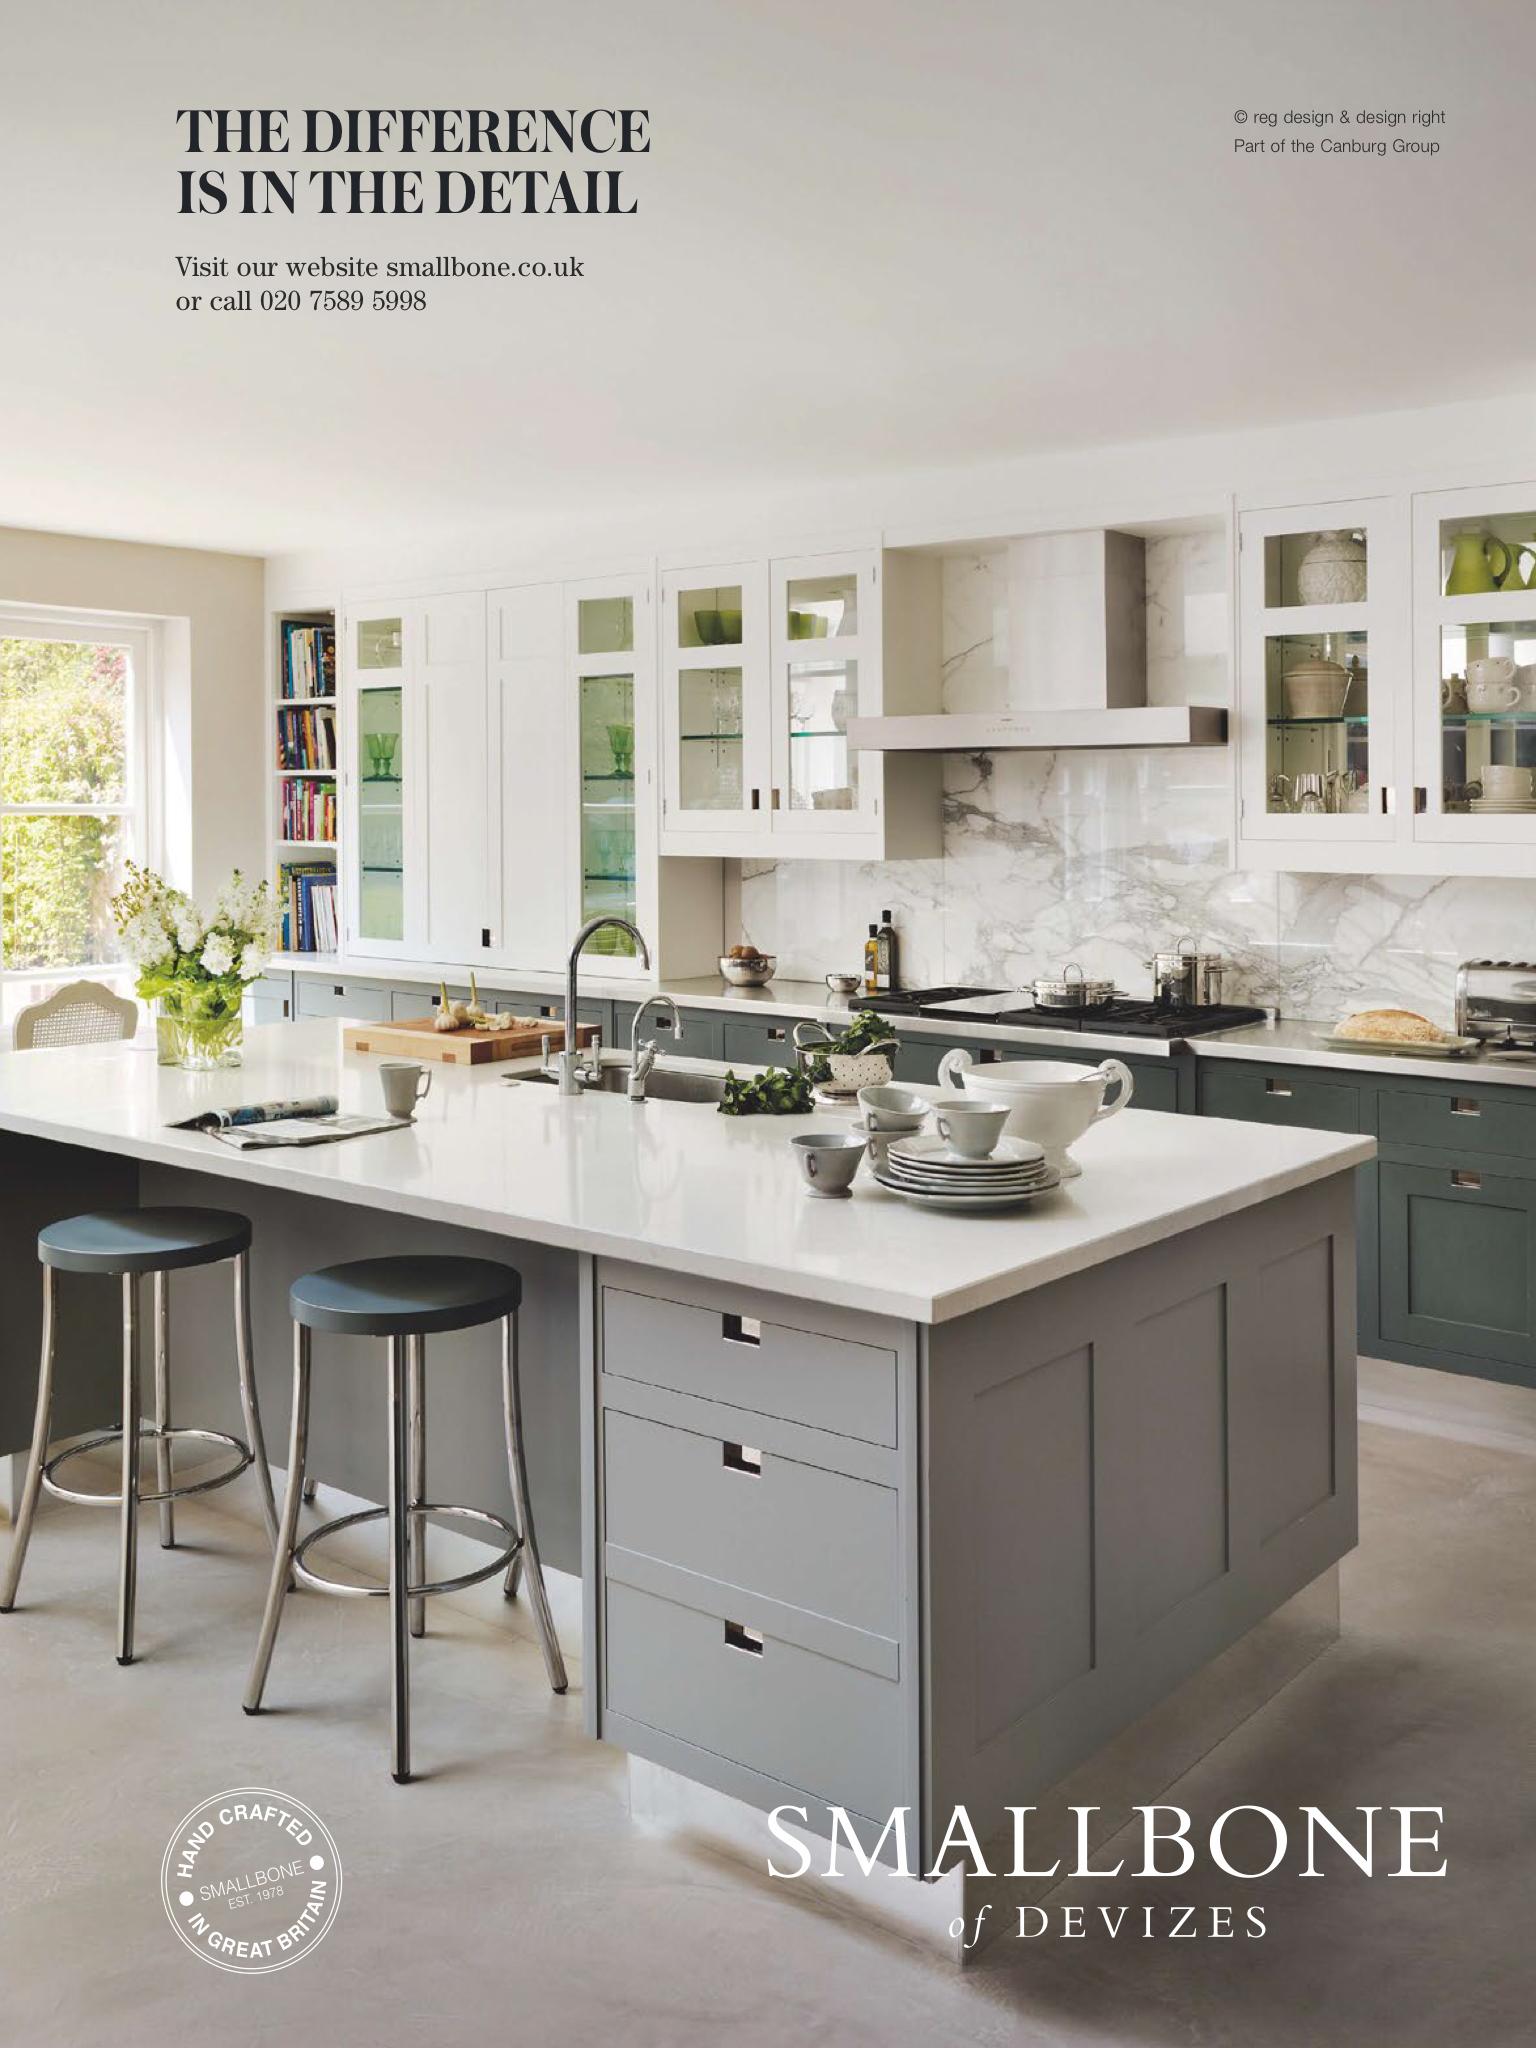 Pin de Cary Lugo en Kitchen ideas | Pinterest